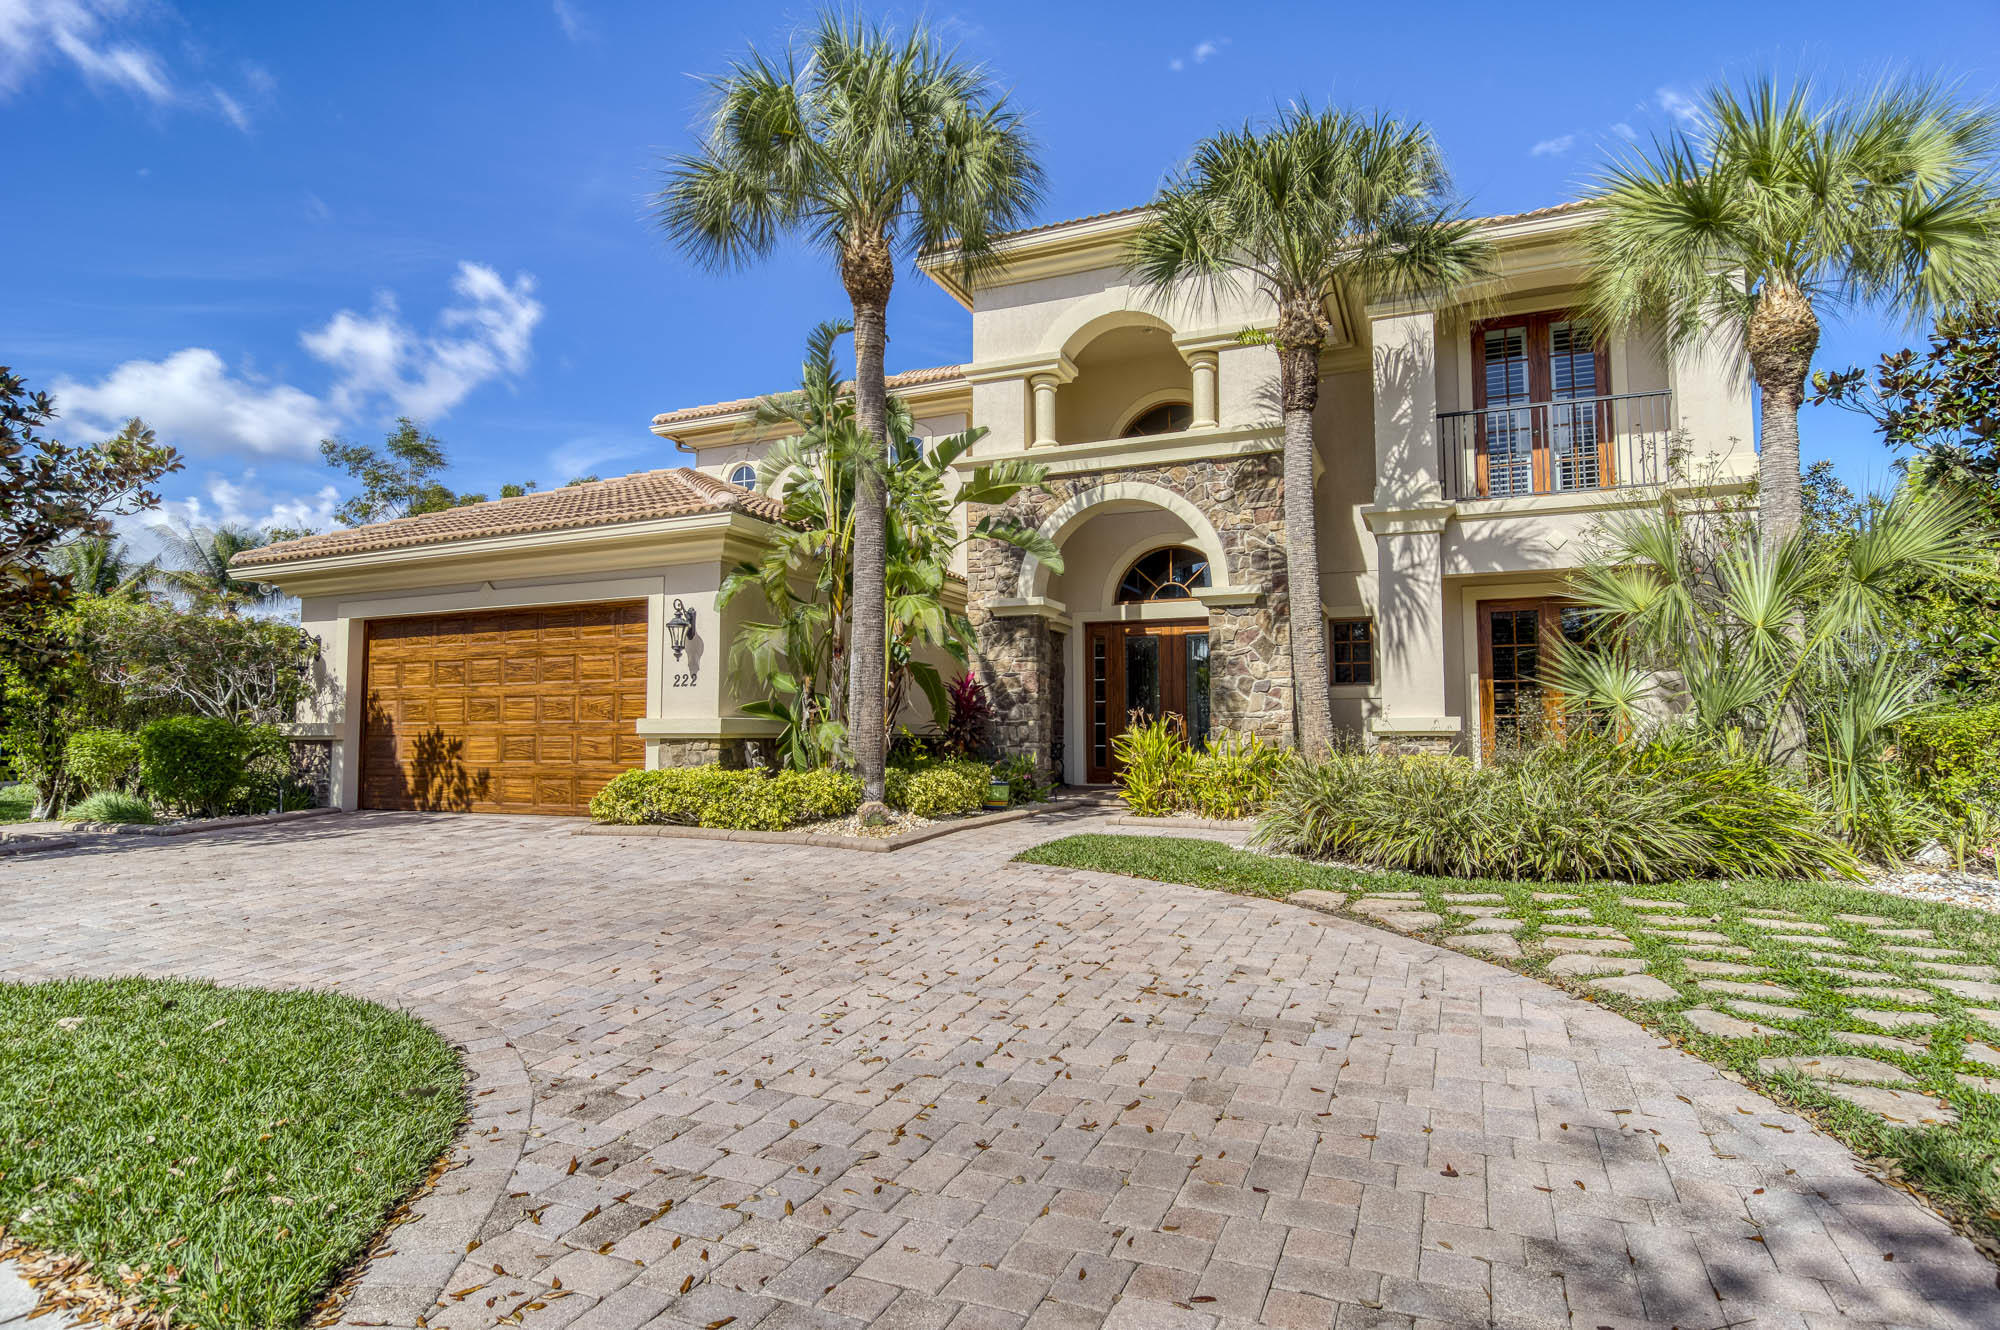 222 Sonata Drive, Jupiter, Florida 33478, 6 Bedrooms Bedrooms, ,5 BathroomsBathrooms,A,Single family,Sonata,RX-10692743